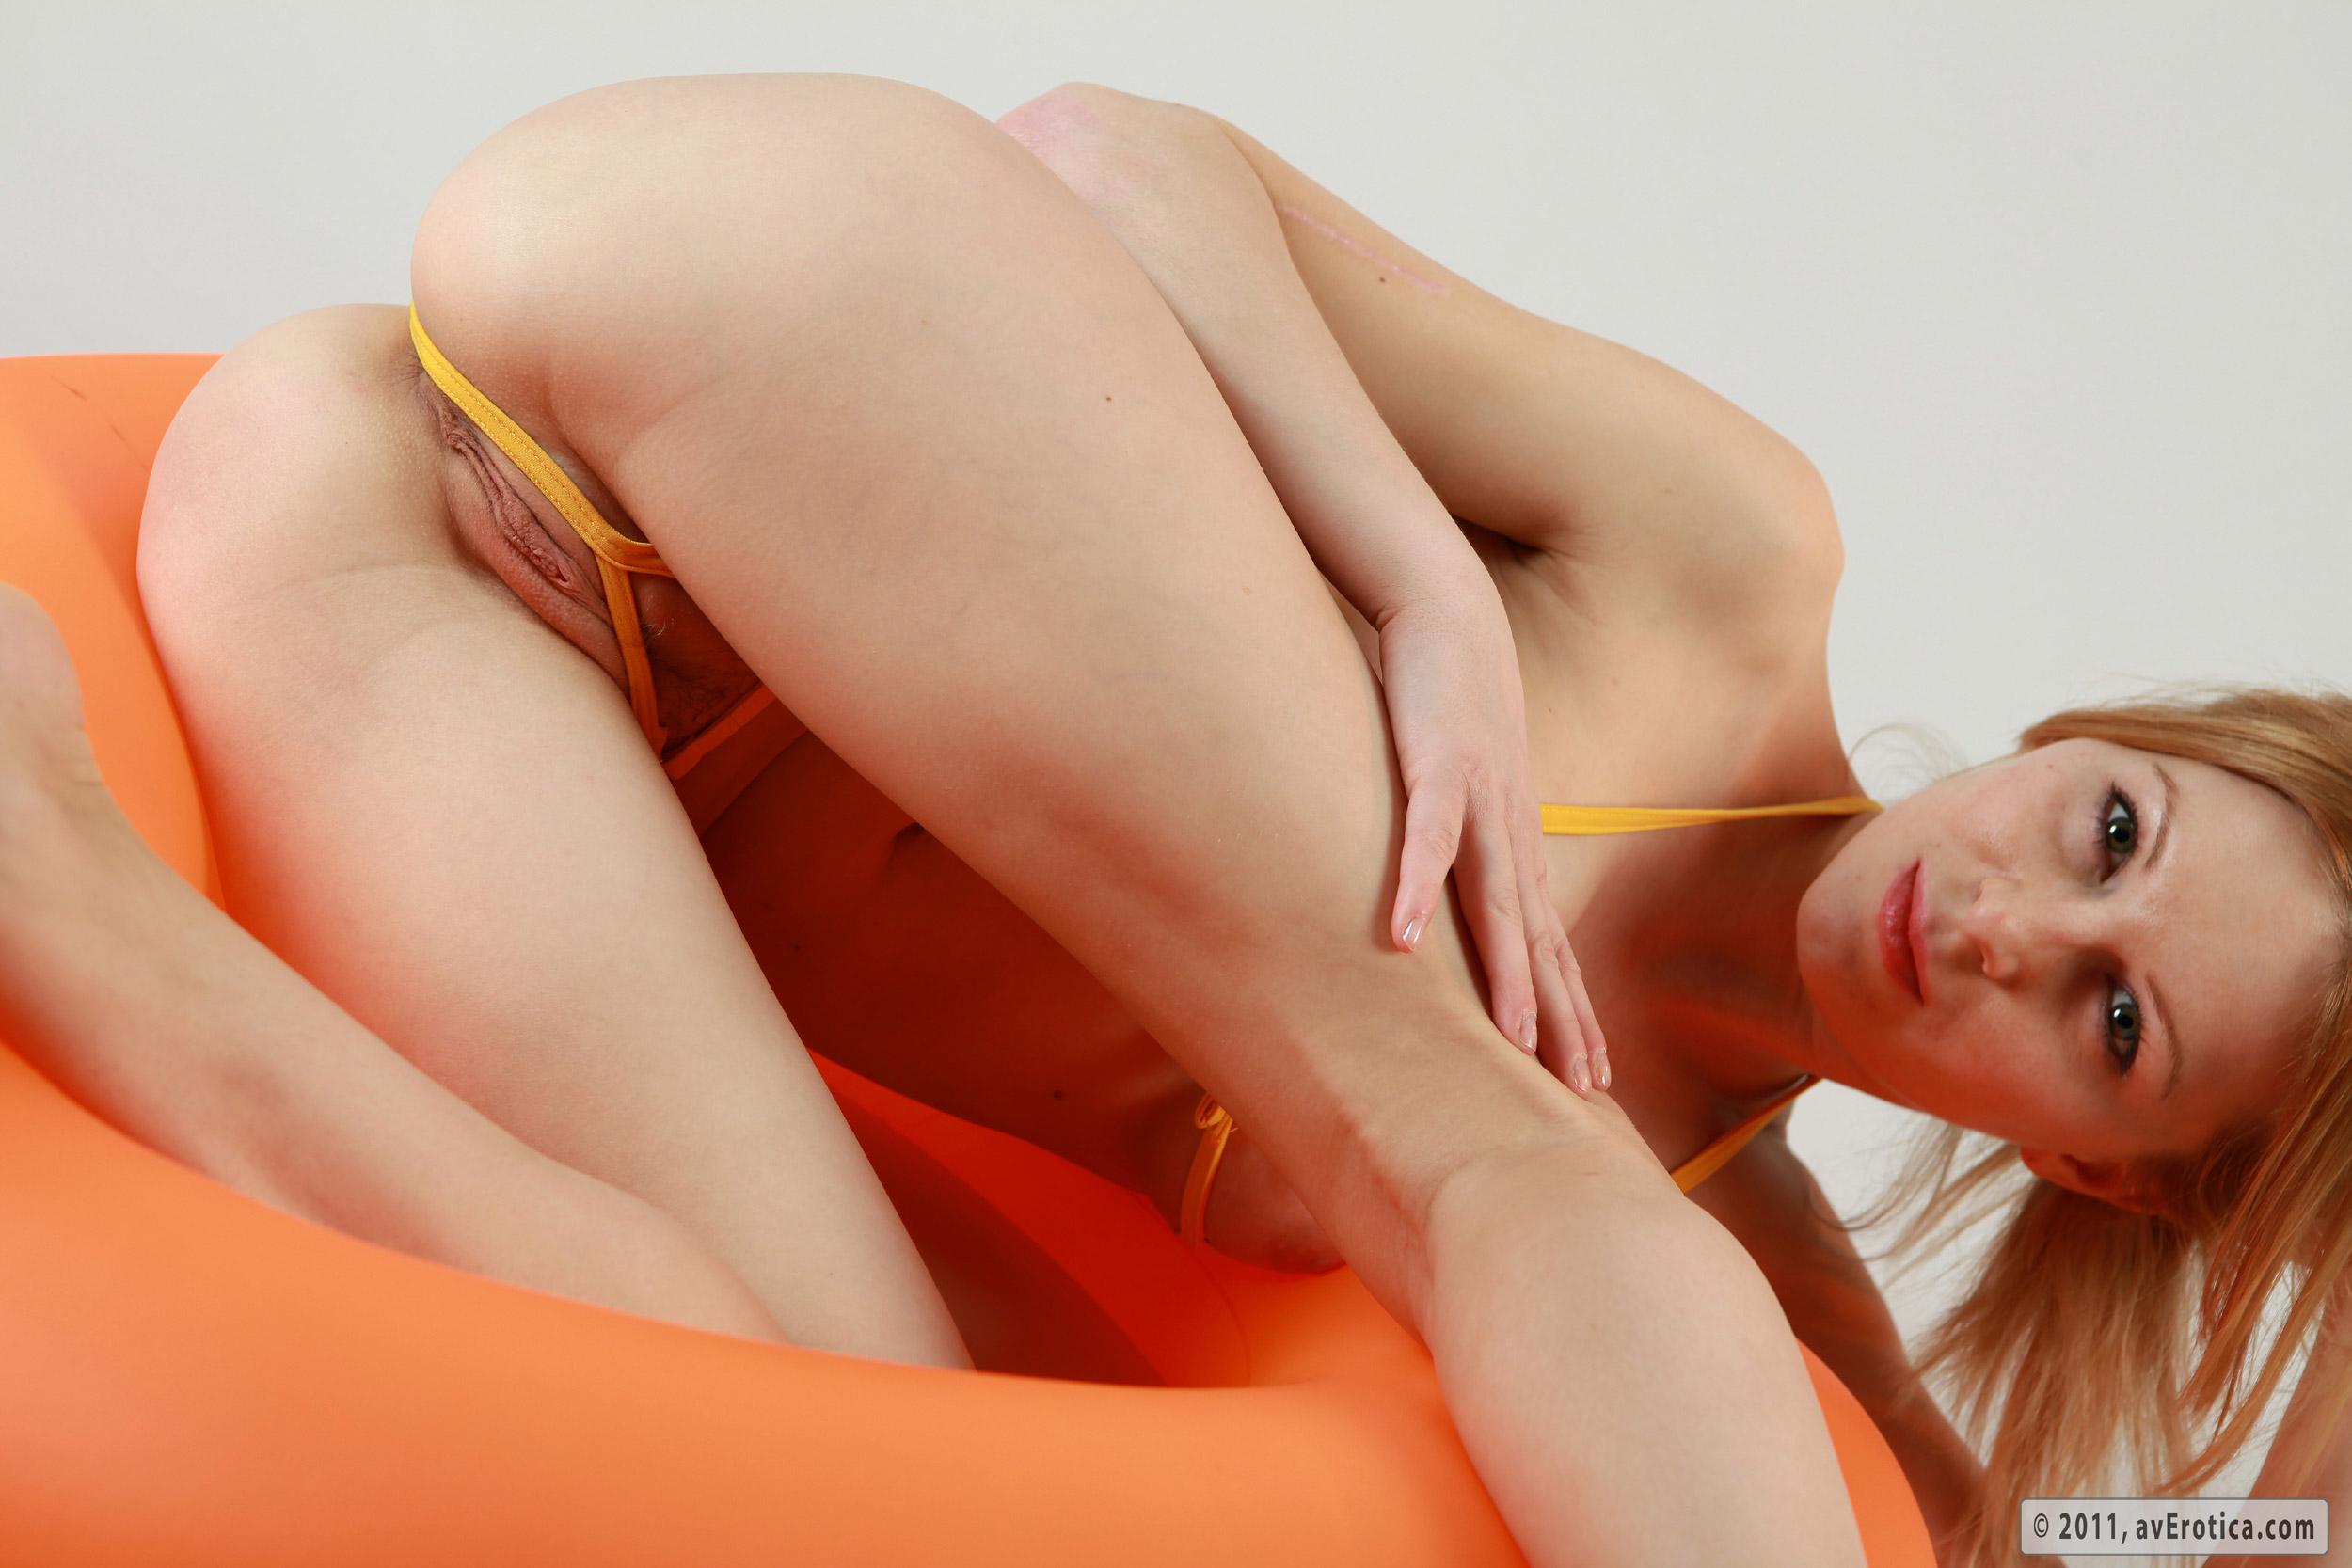 Extreme Bikini 39 x treme bikini girls